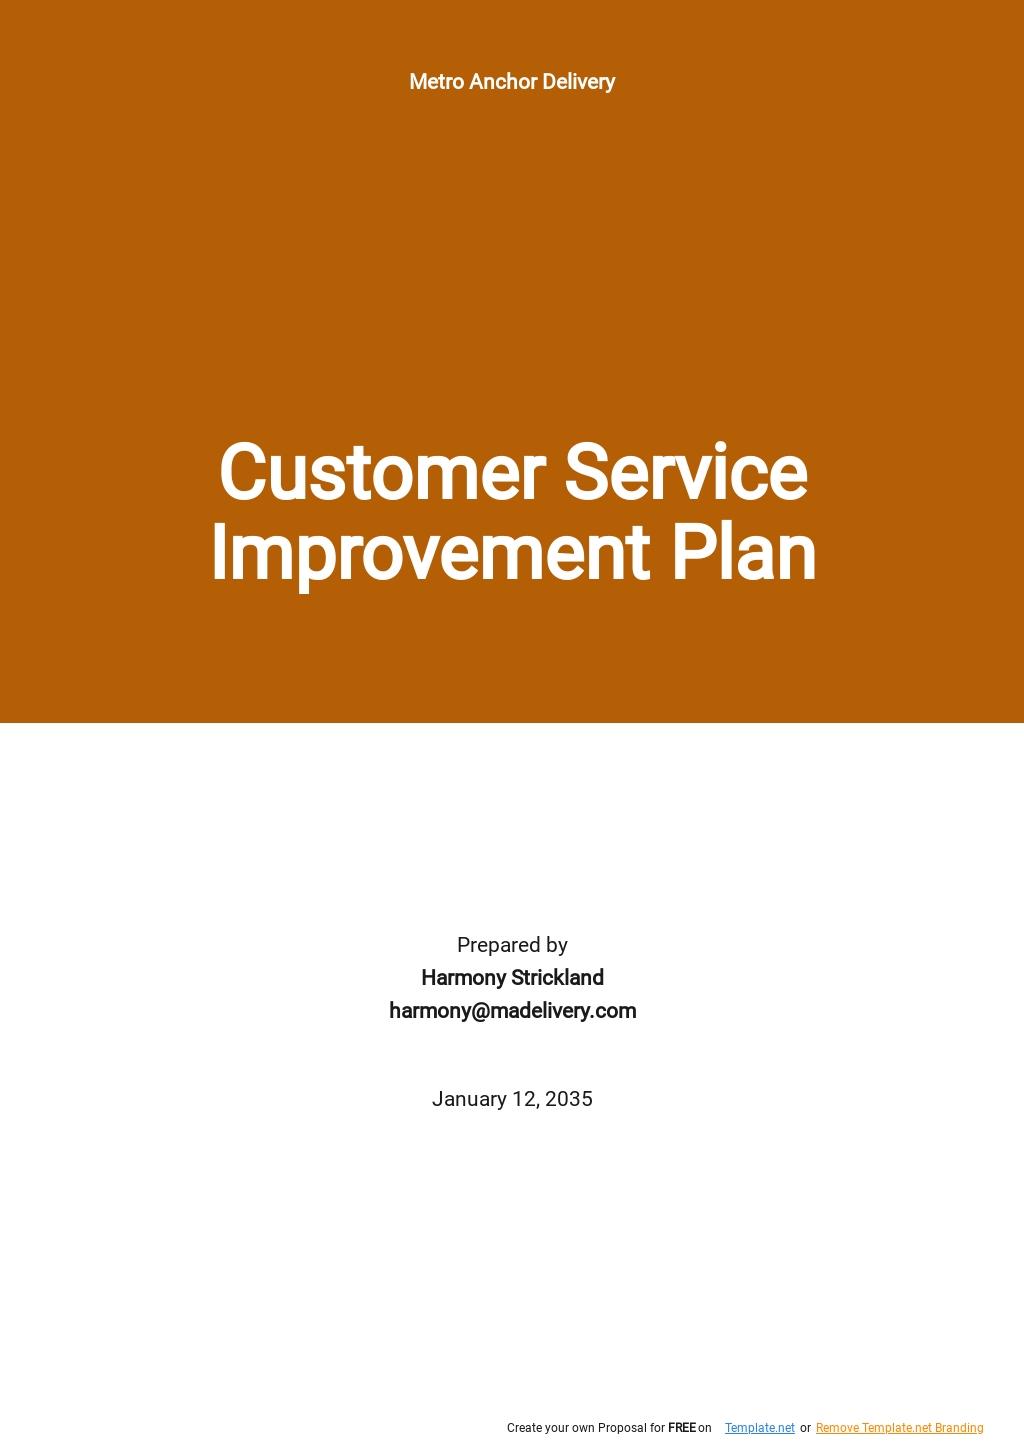 Customer Service Improvement Plan Template.jpe